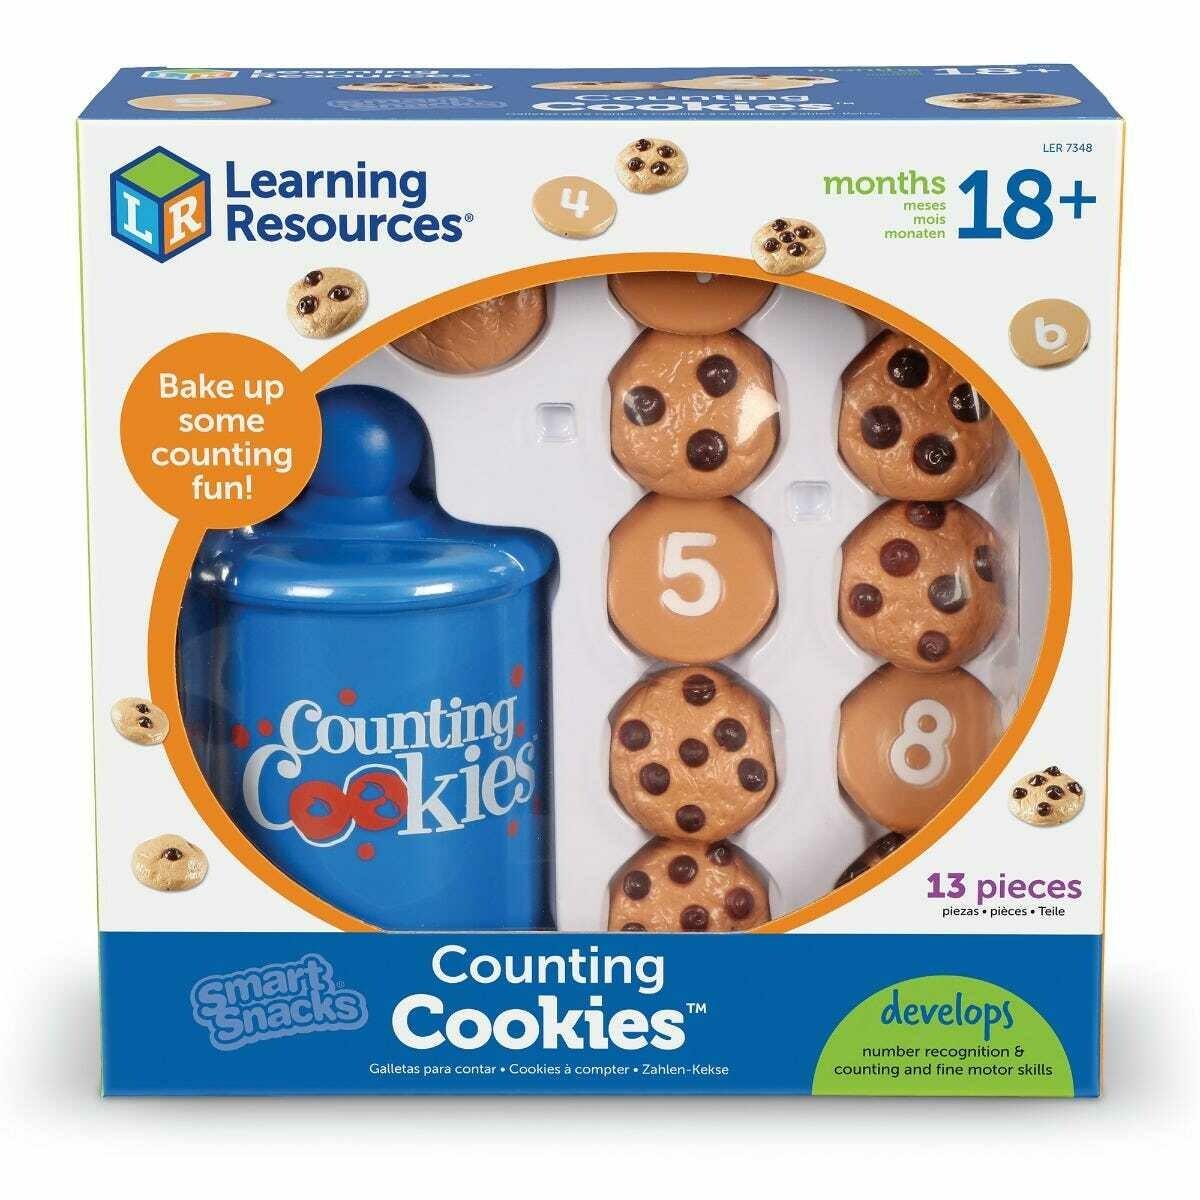 Smart Snacks® Counting Cookies™